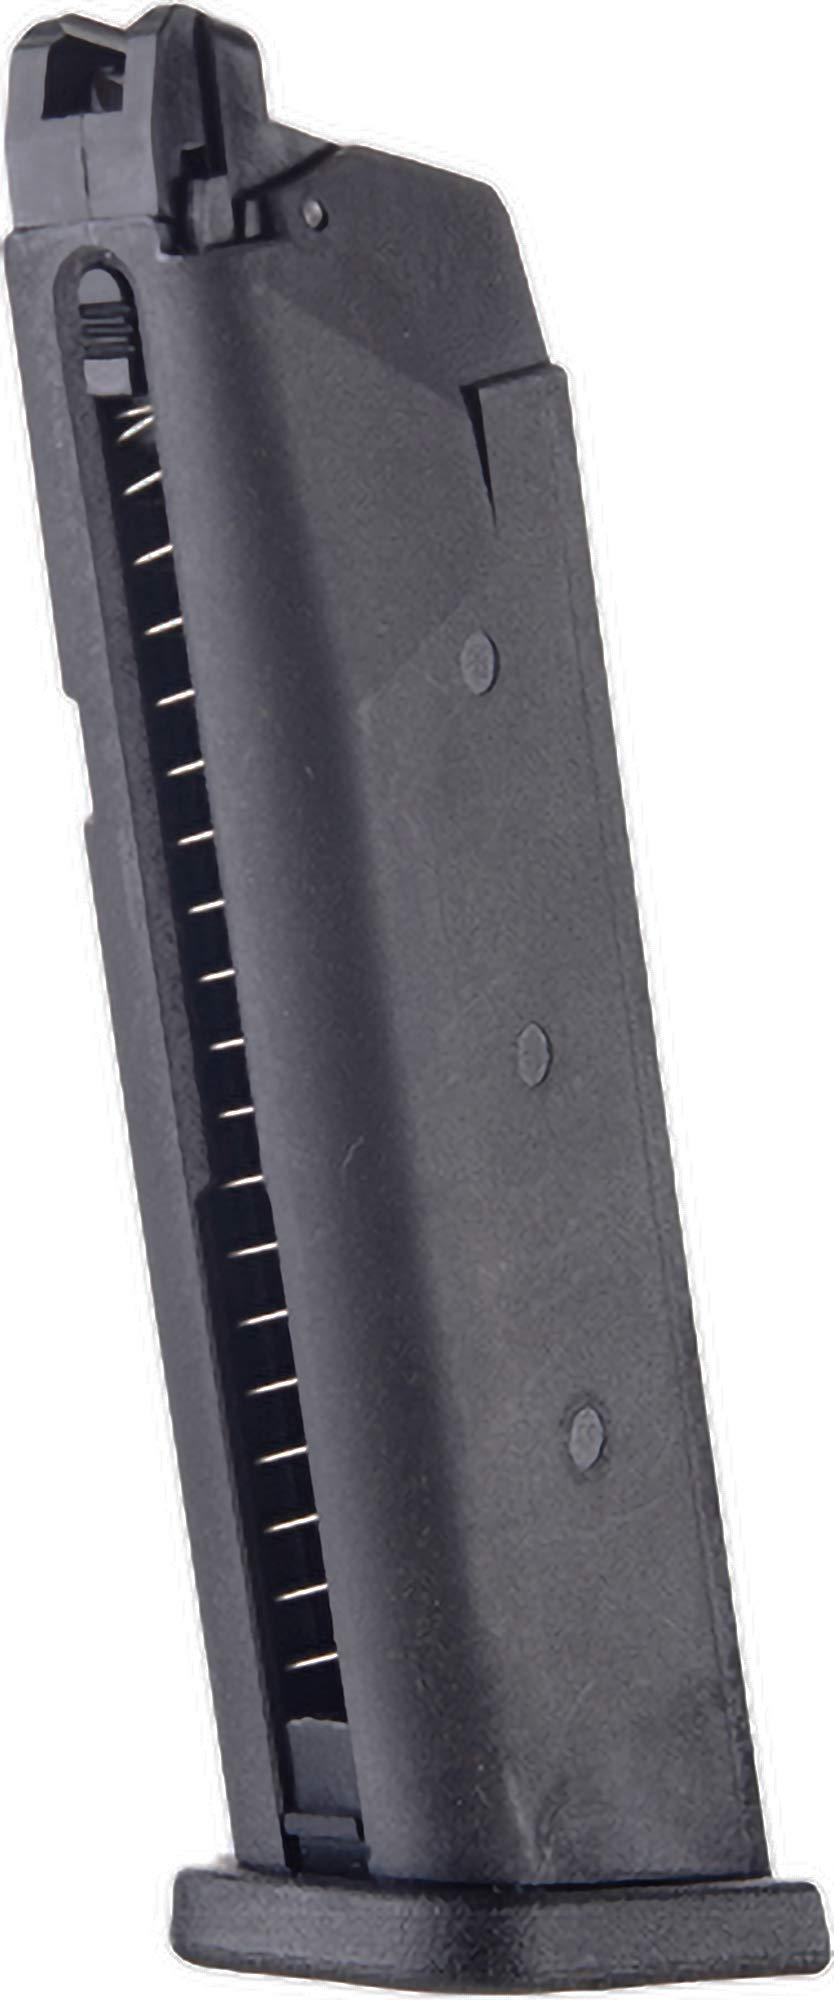 SD6 AEG by AirsoftGoGo 120rds Magazine for Marui Standard MP5 MP5K MP5A3//A4//A5 MP5SD5